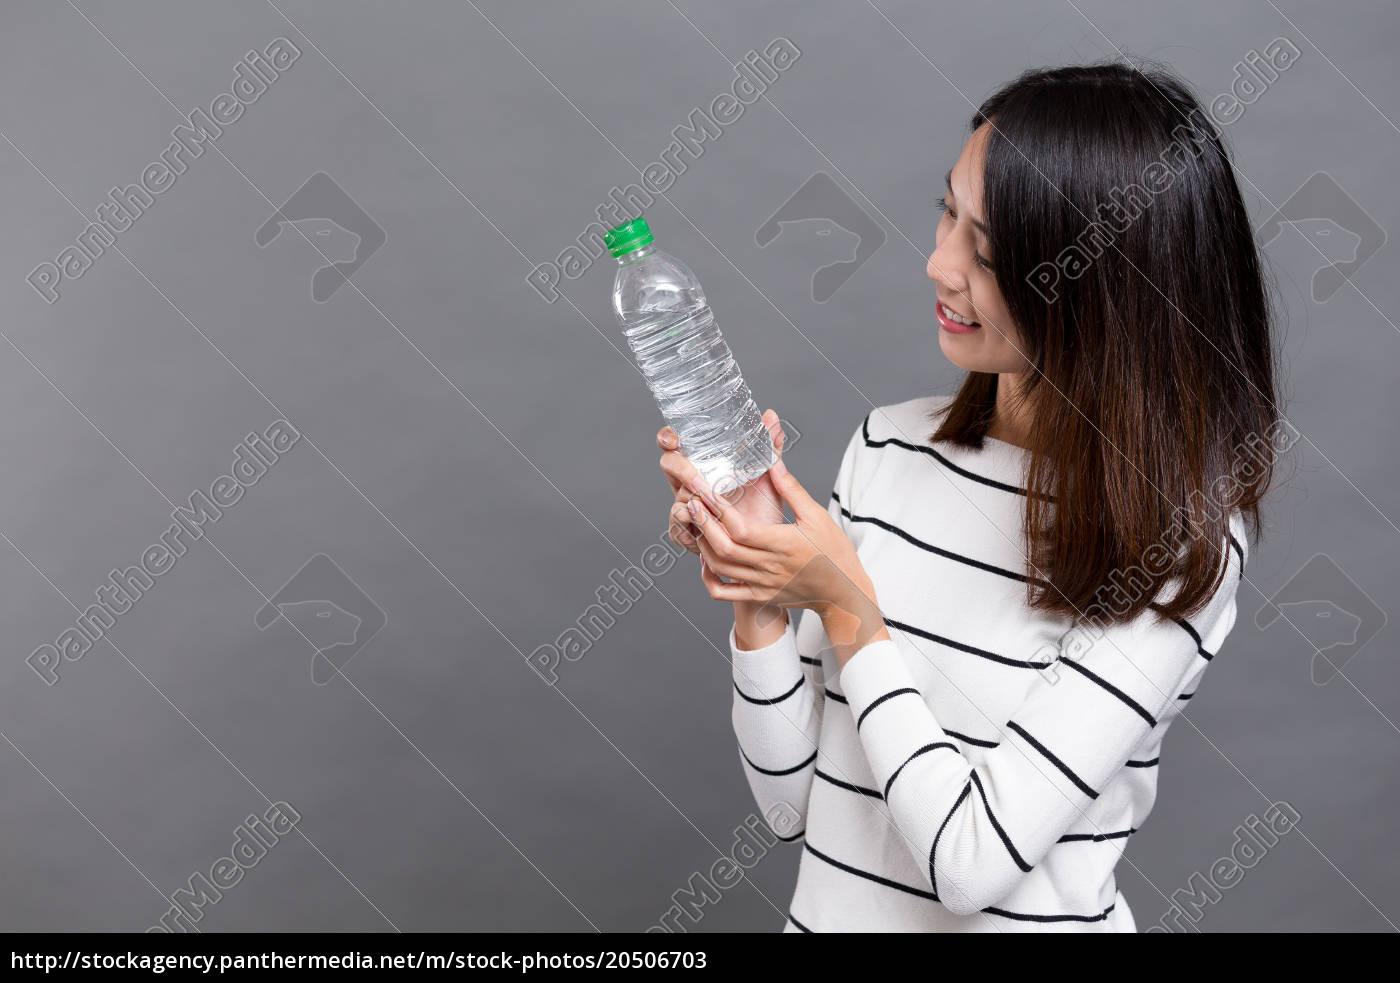 woman, holding, water, bottle - 20506703